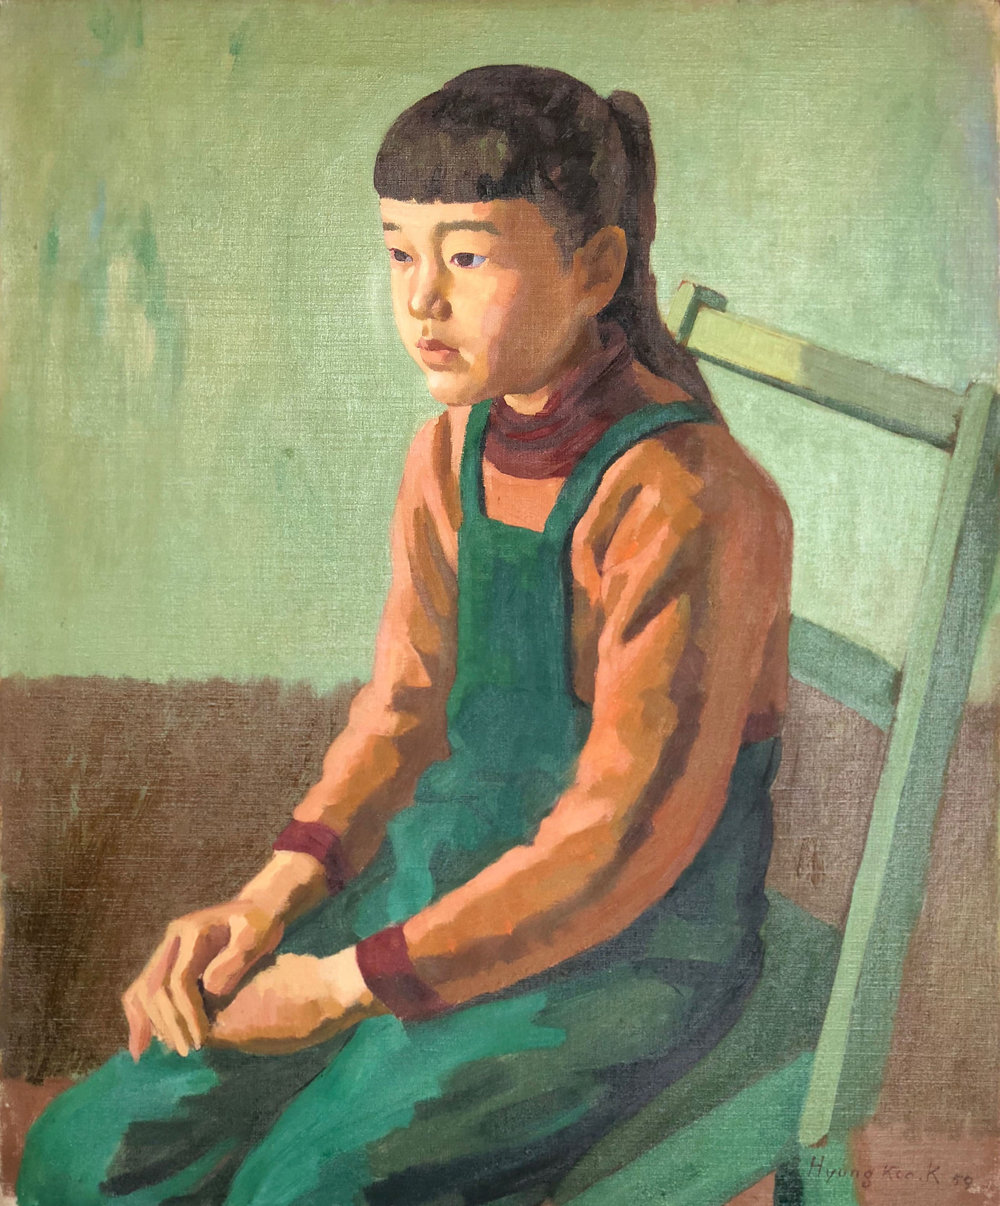 Young Girl, 1959